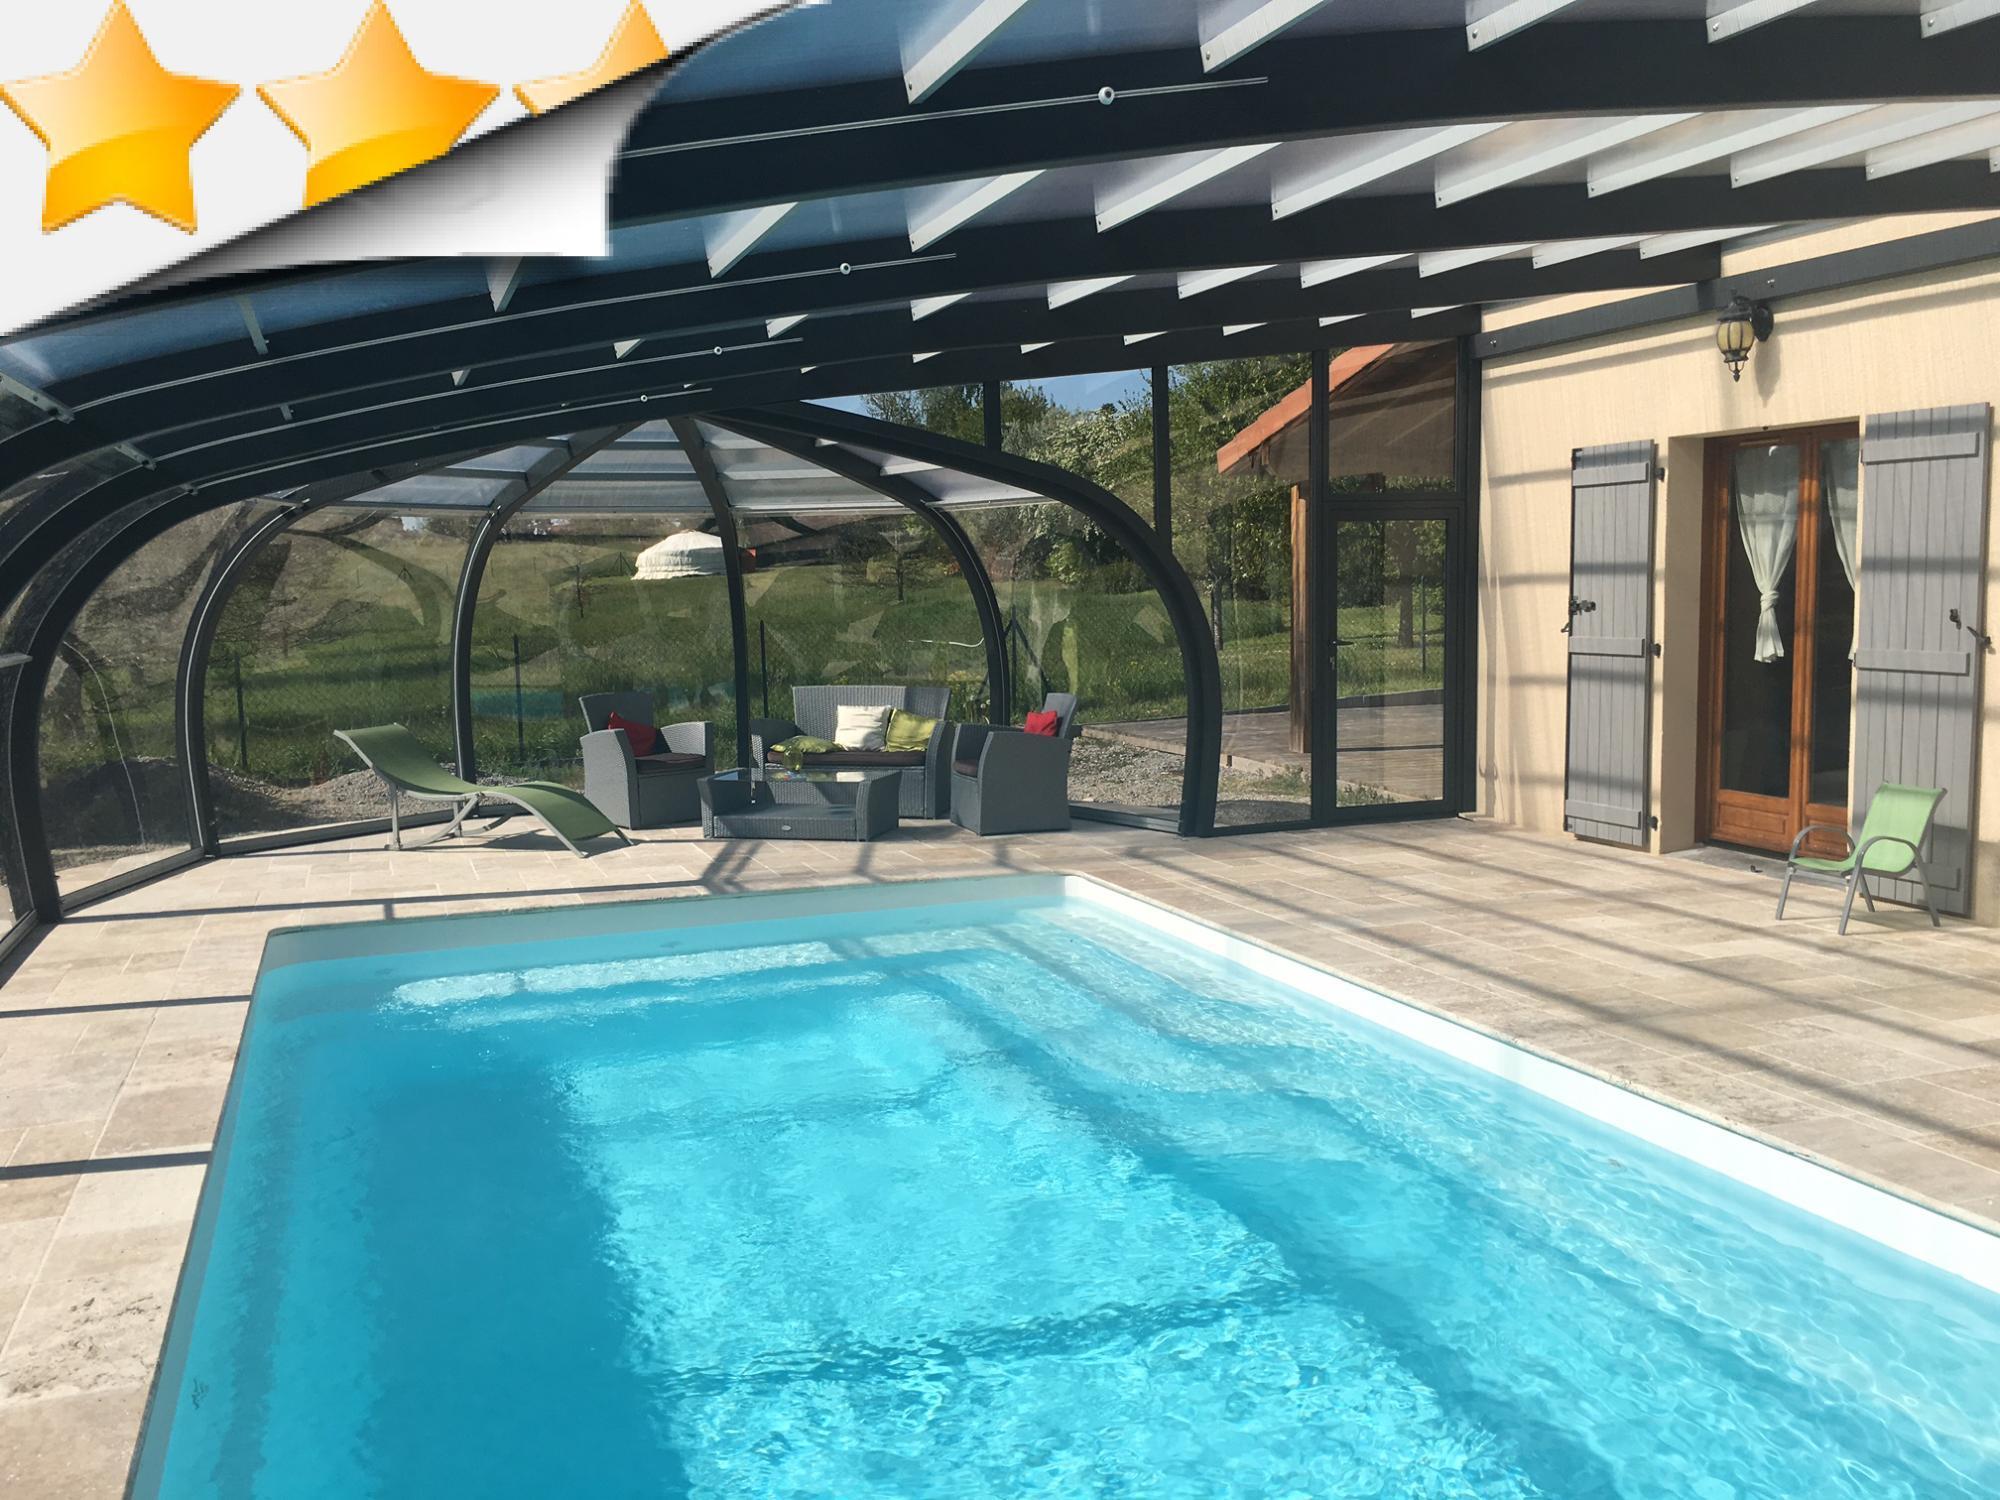 abri de piscine bois piscine semi enterree et abri. Black Bedroom Furniture Sets. Home Design Ideas